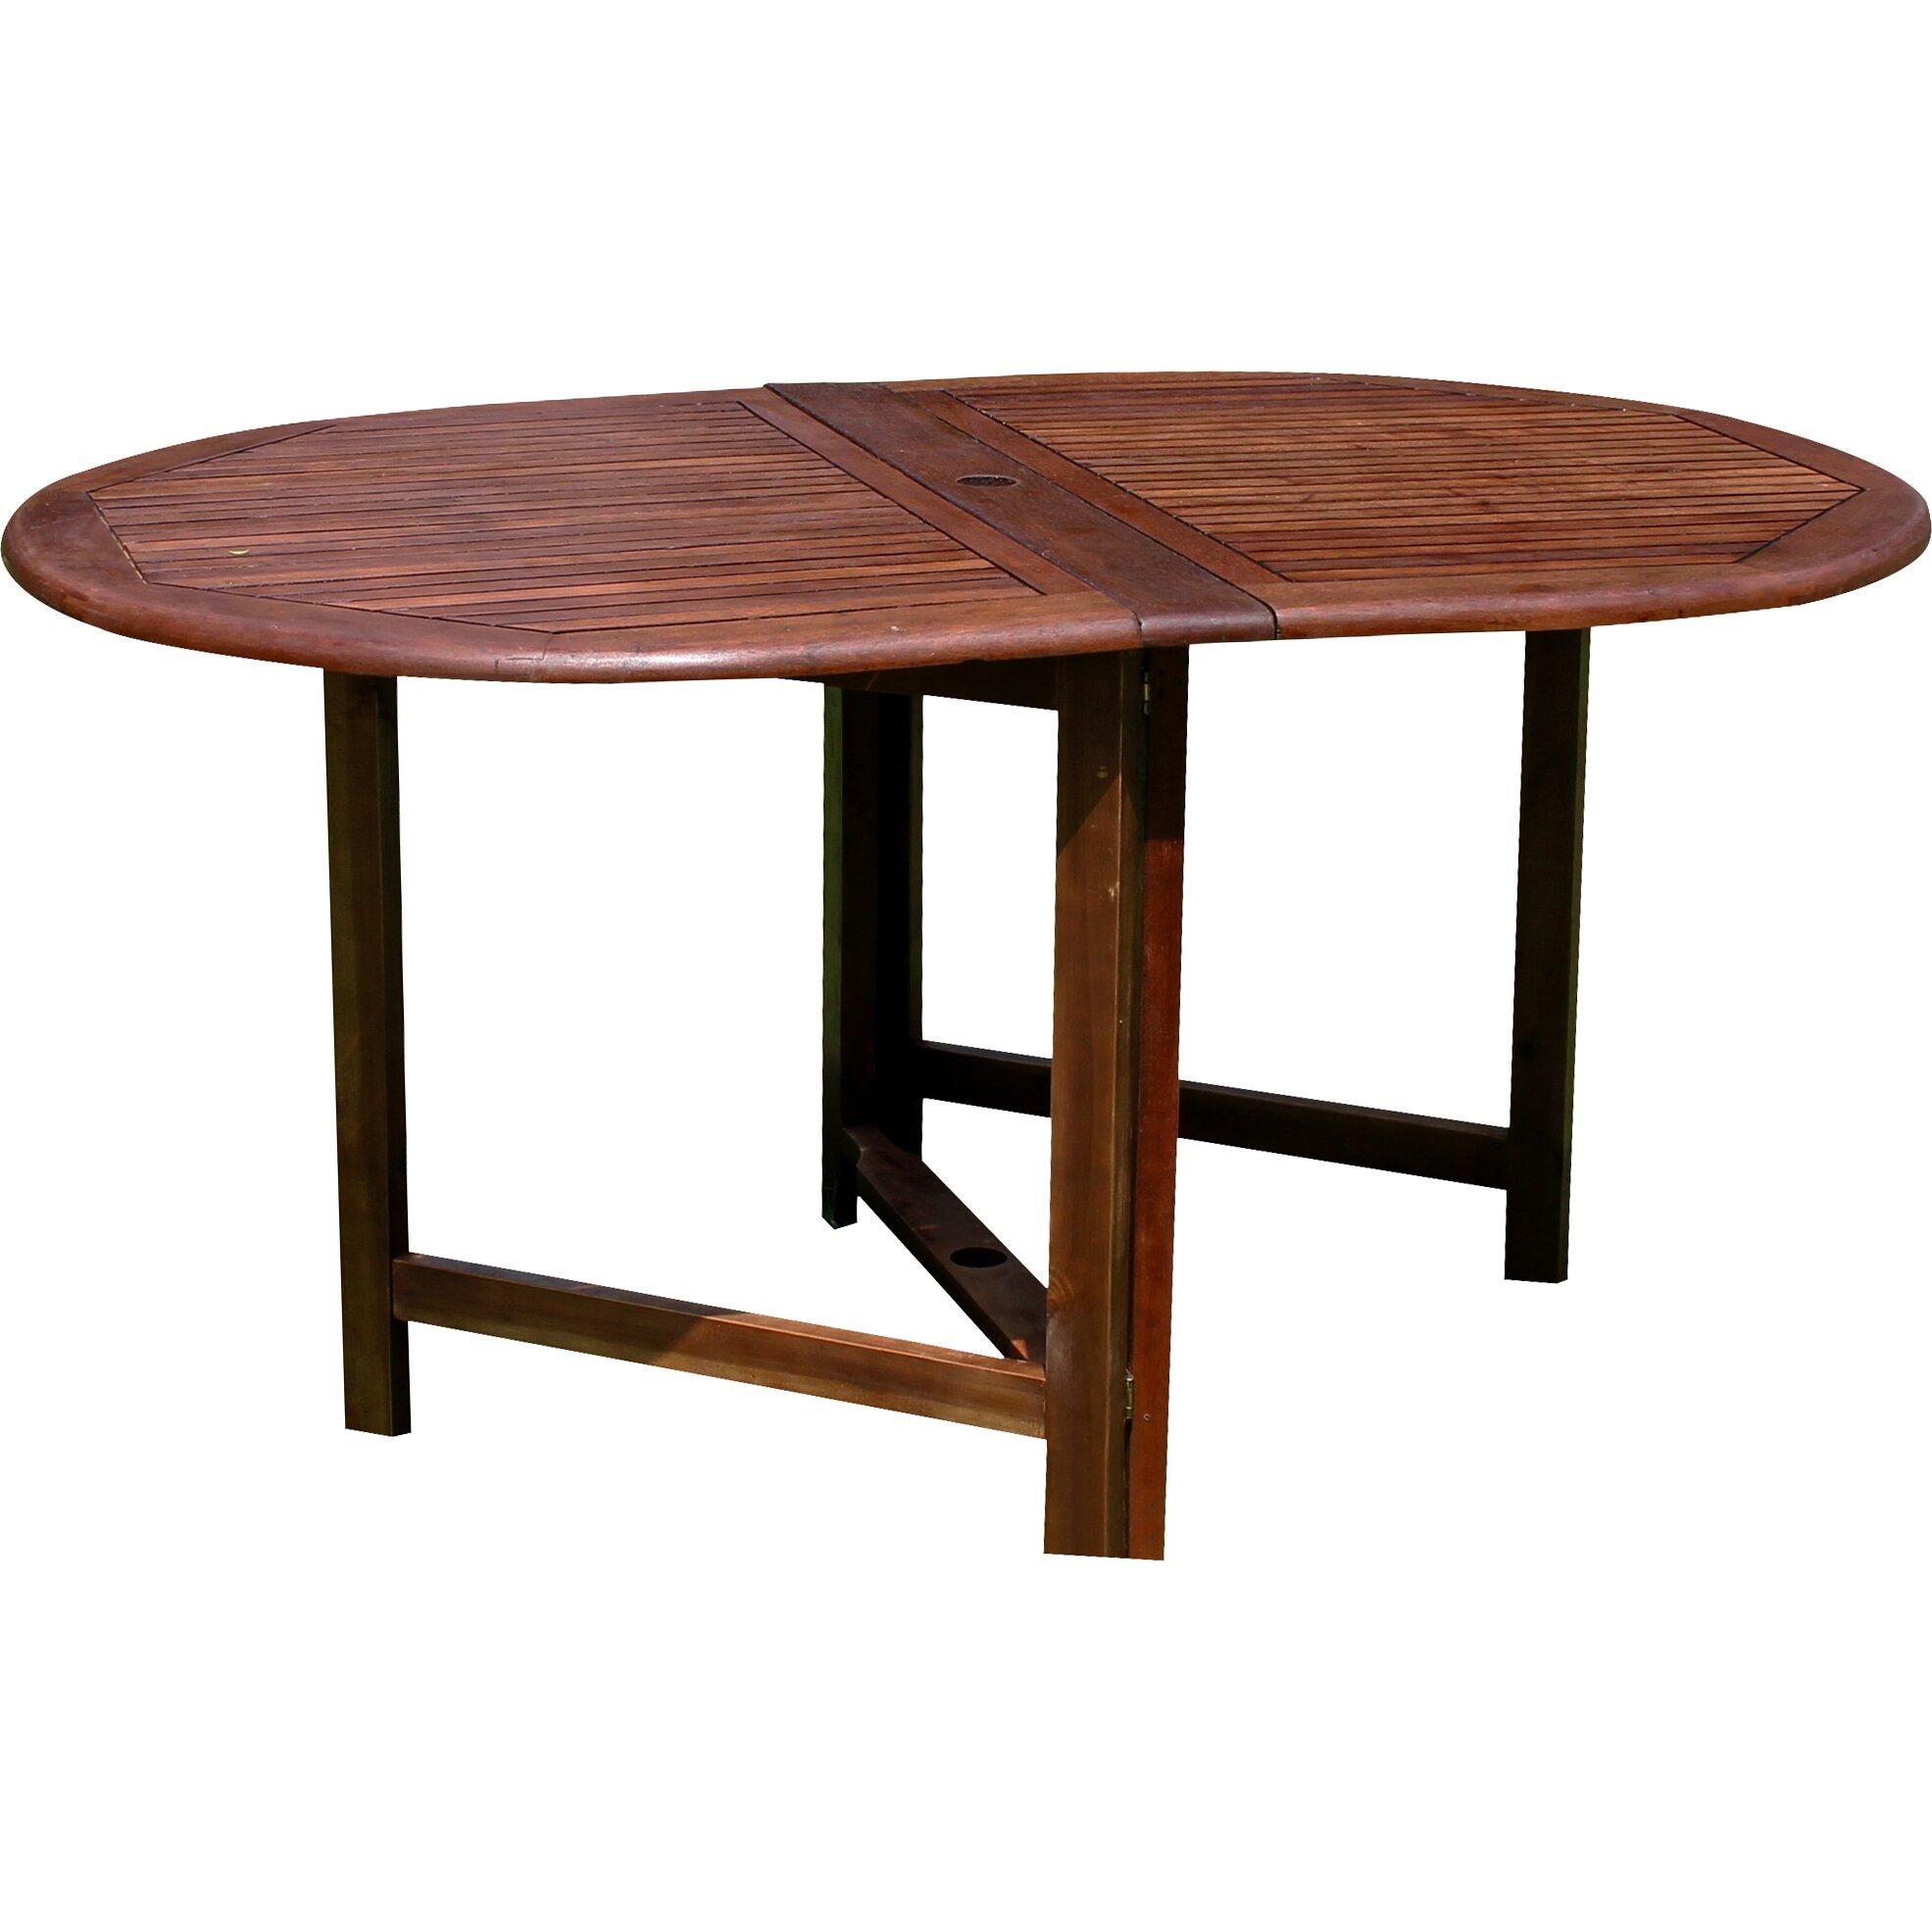 Simplot Dining Table DBHC BRWT